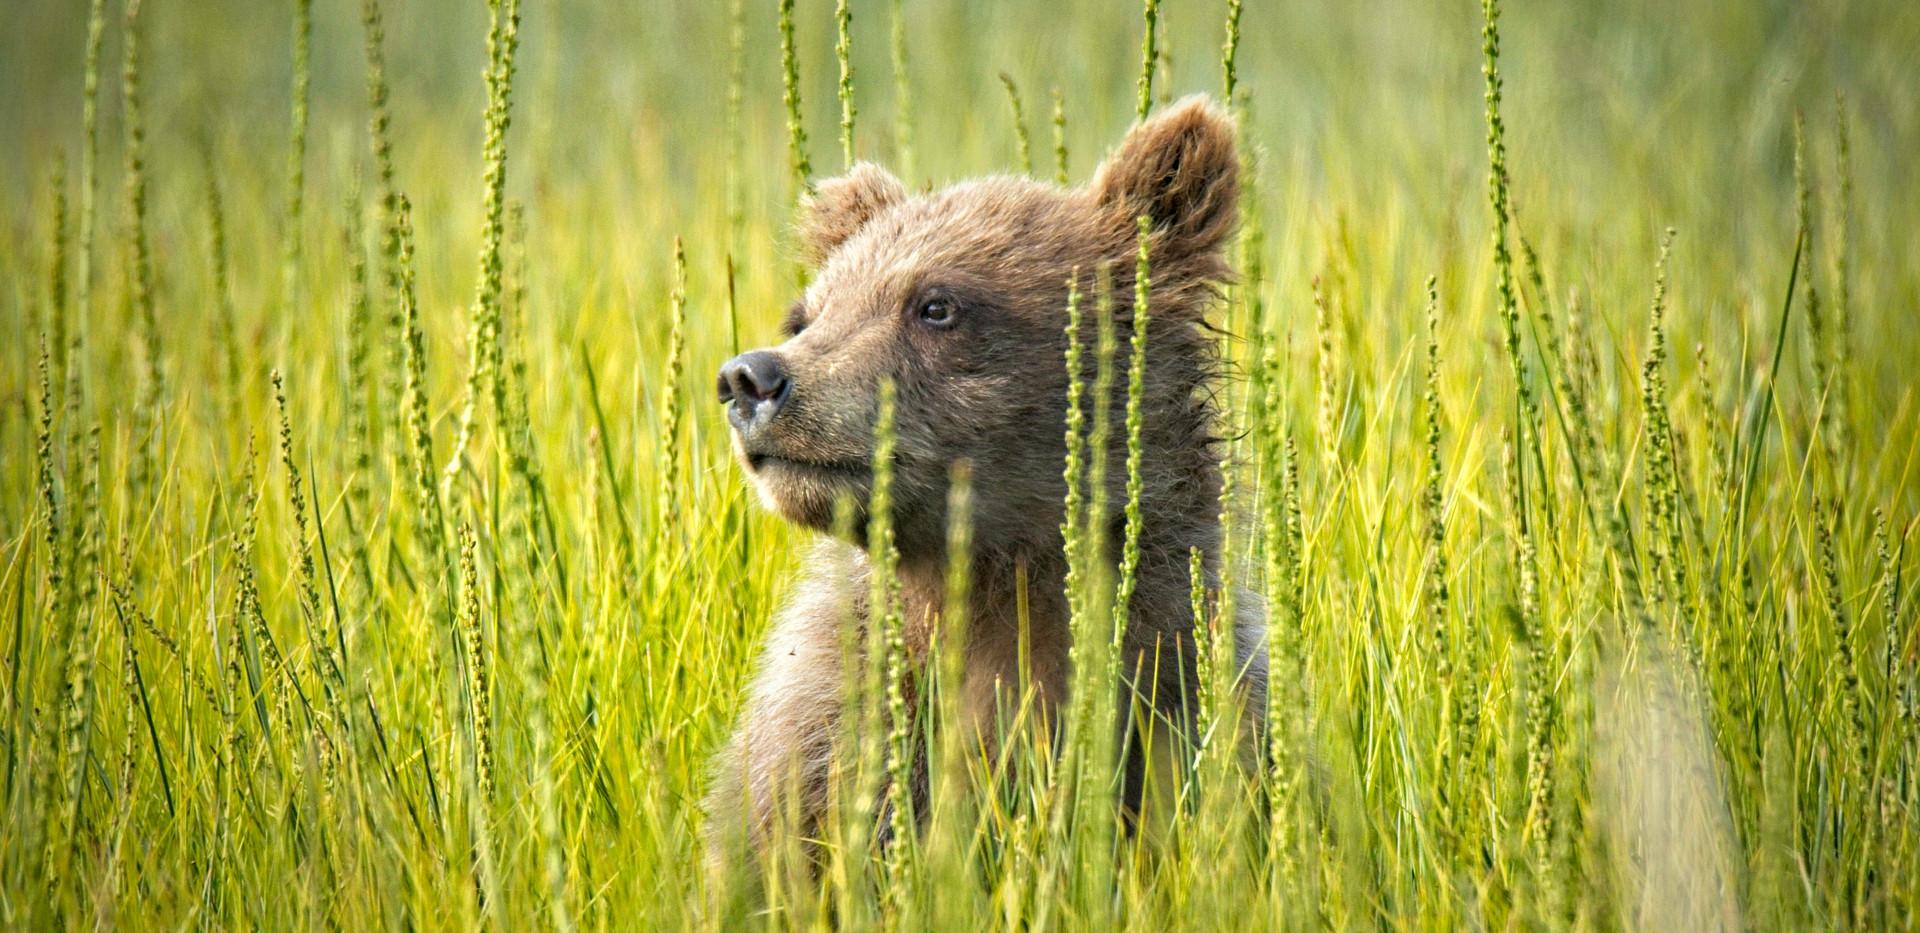 Cub in Green Grass